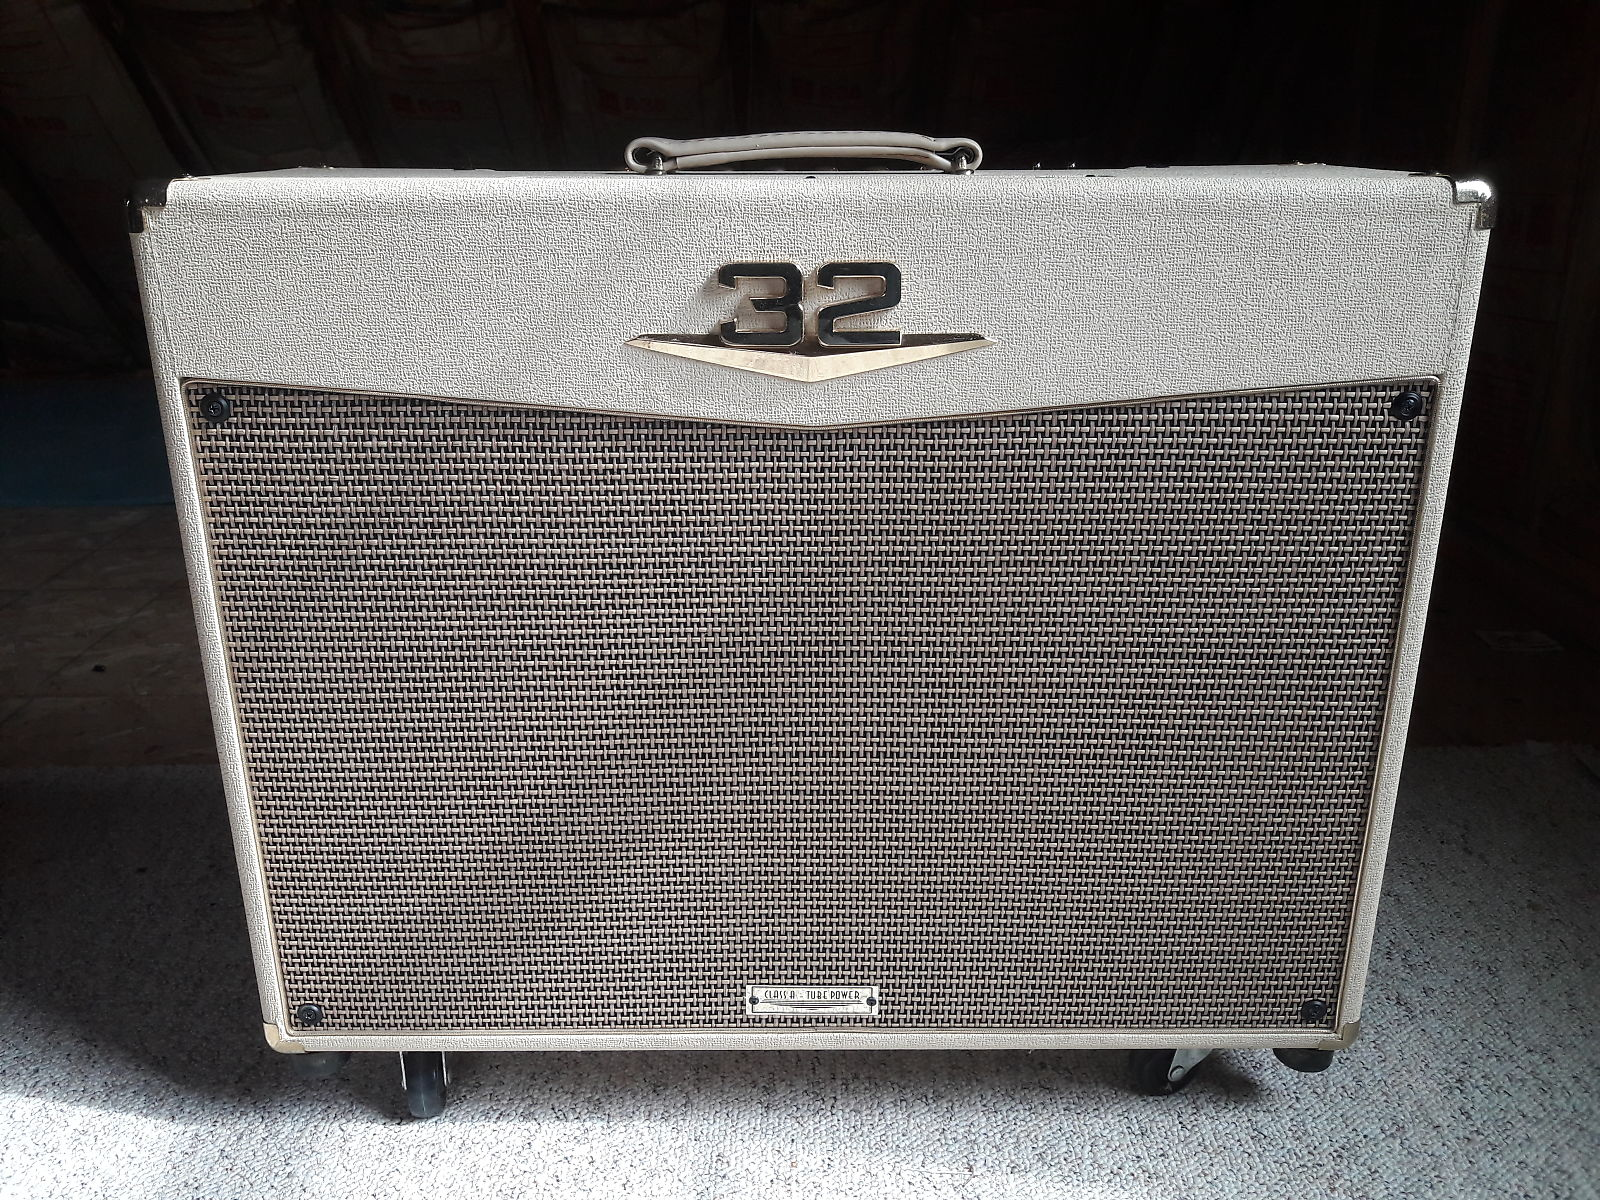 Crate Palomino V32 30 Watt Tube Guitar Combo Amp Reverb Tinela Handbag Mud